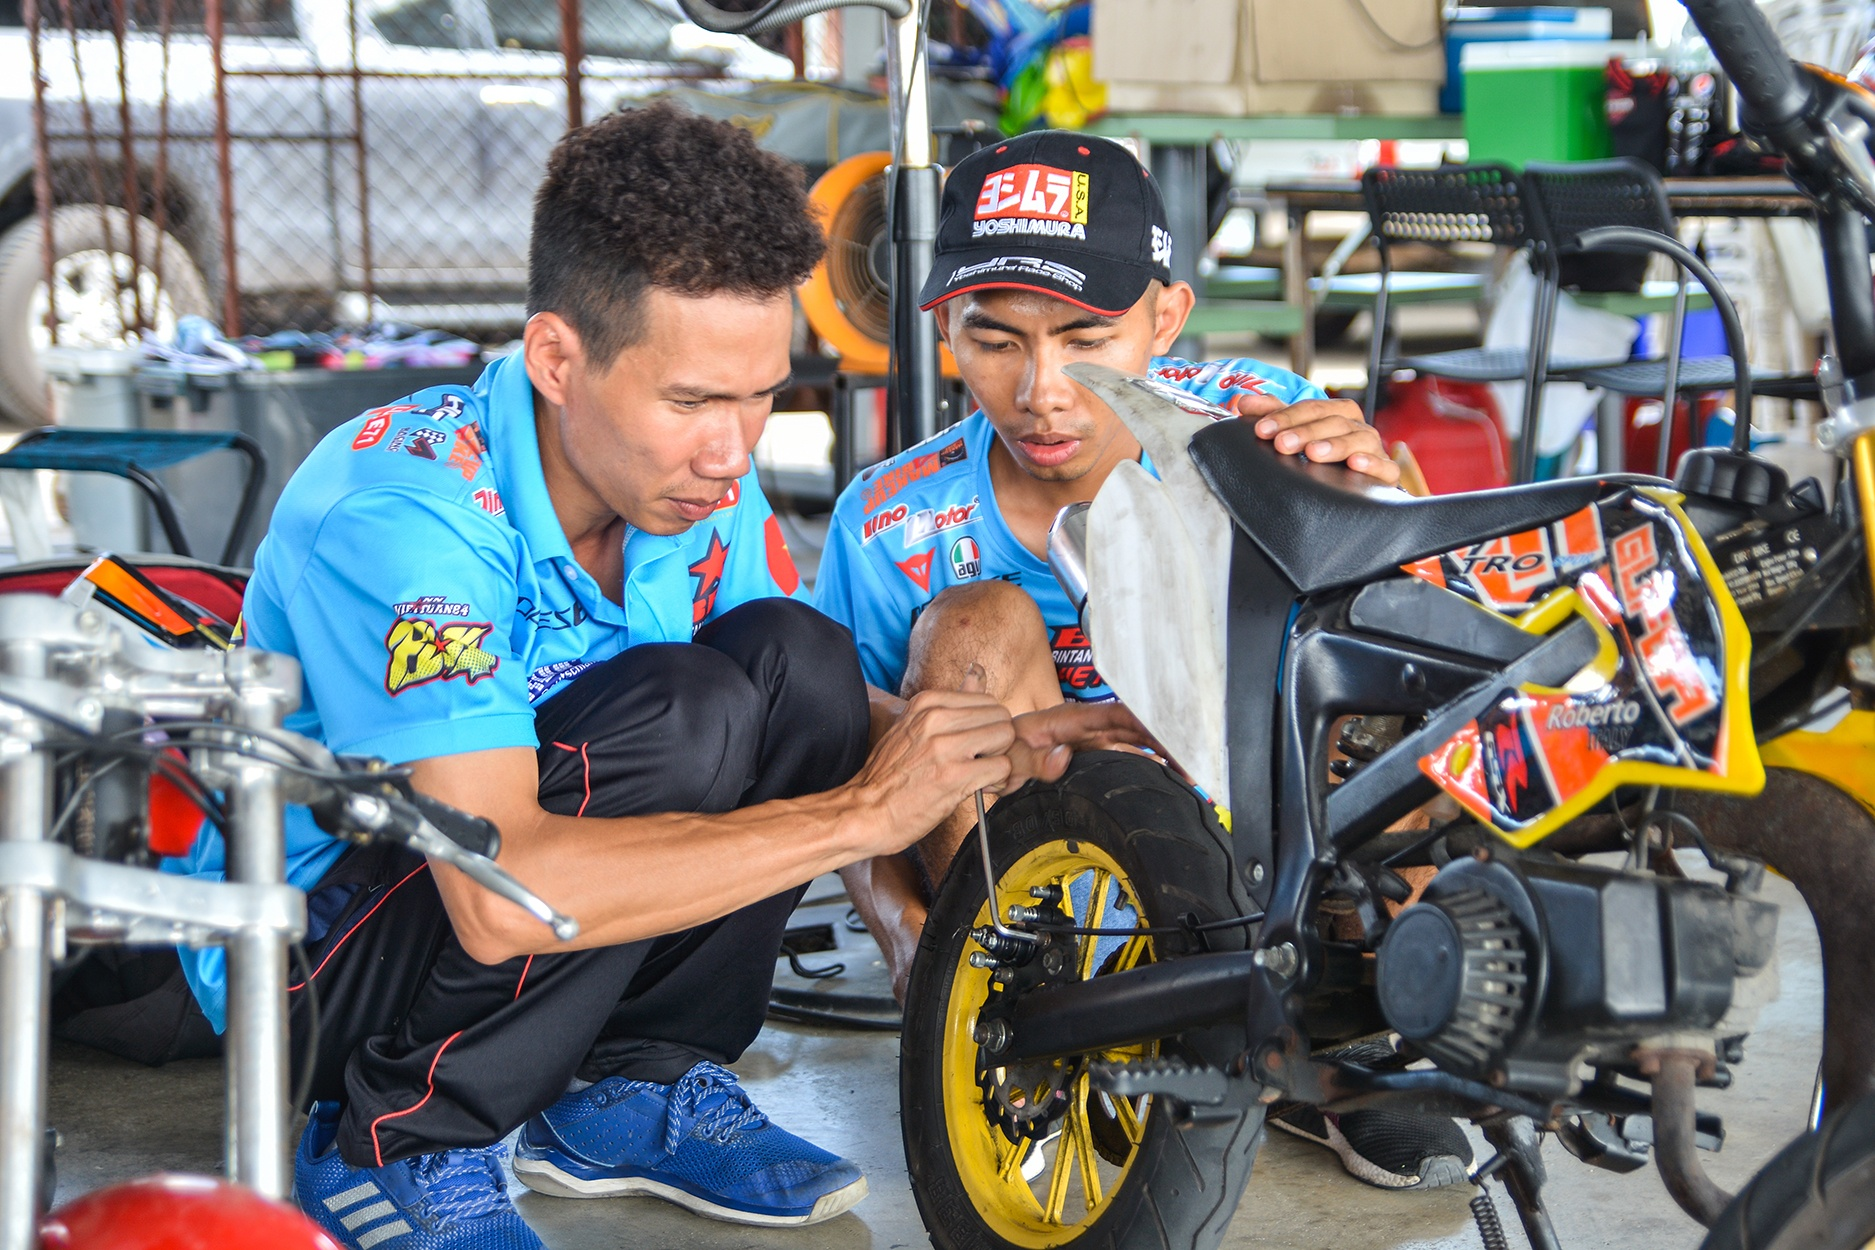 Giai dua moto tre em o Thai Lan va nhung giac mo MotoGP hinh anh 13